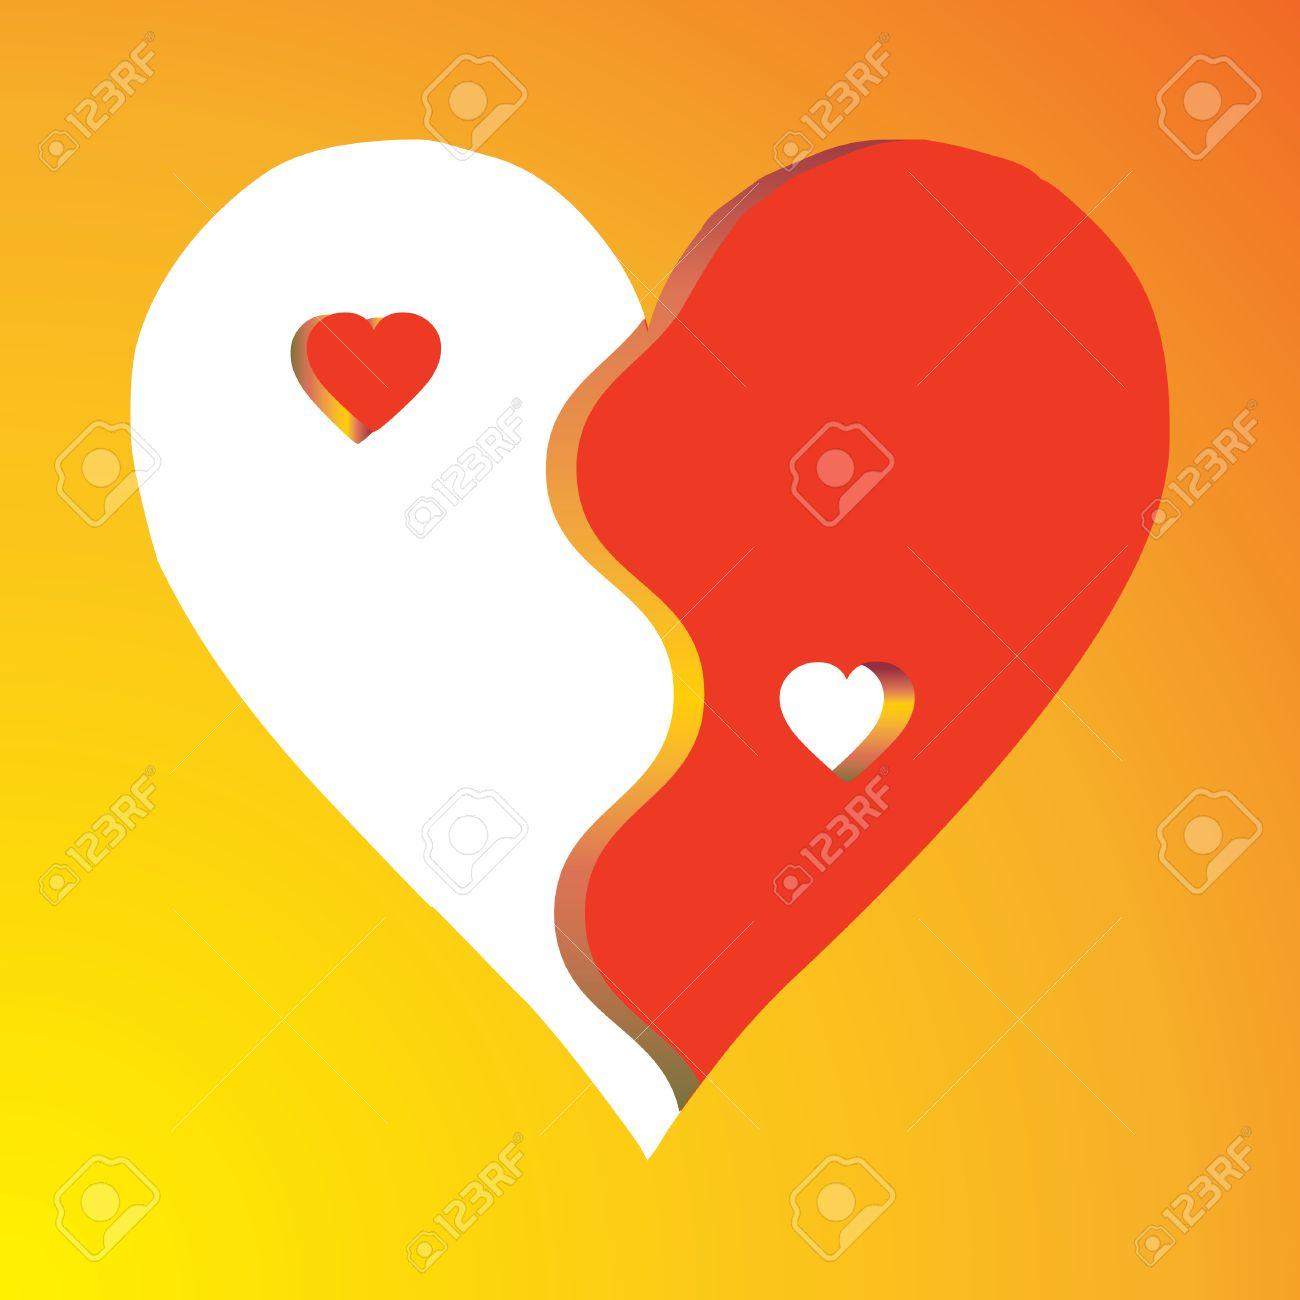 Love Yin Yang on yellow background, vector Stock Vector - 6262766